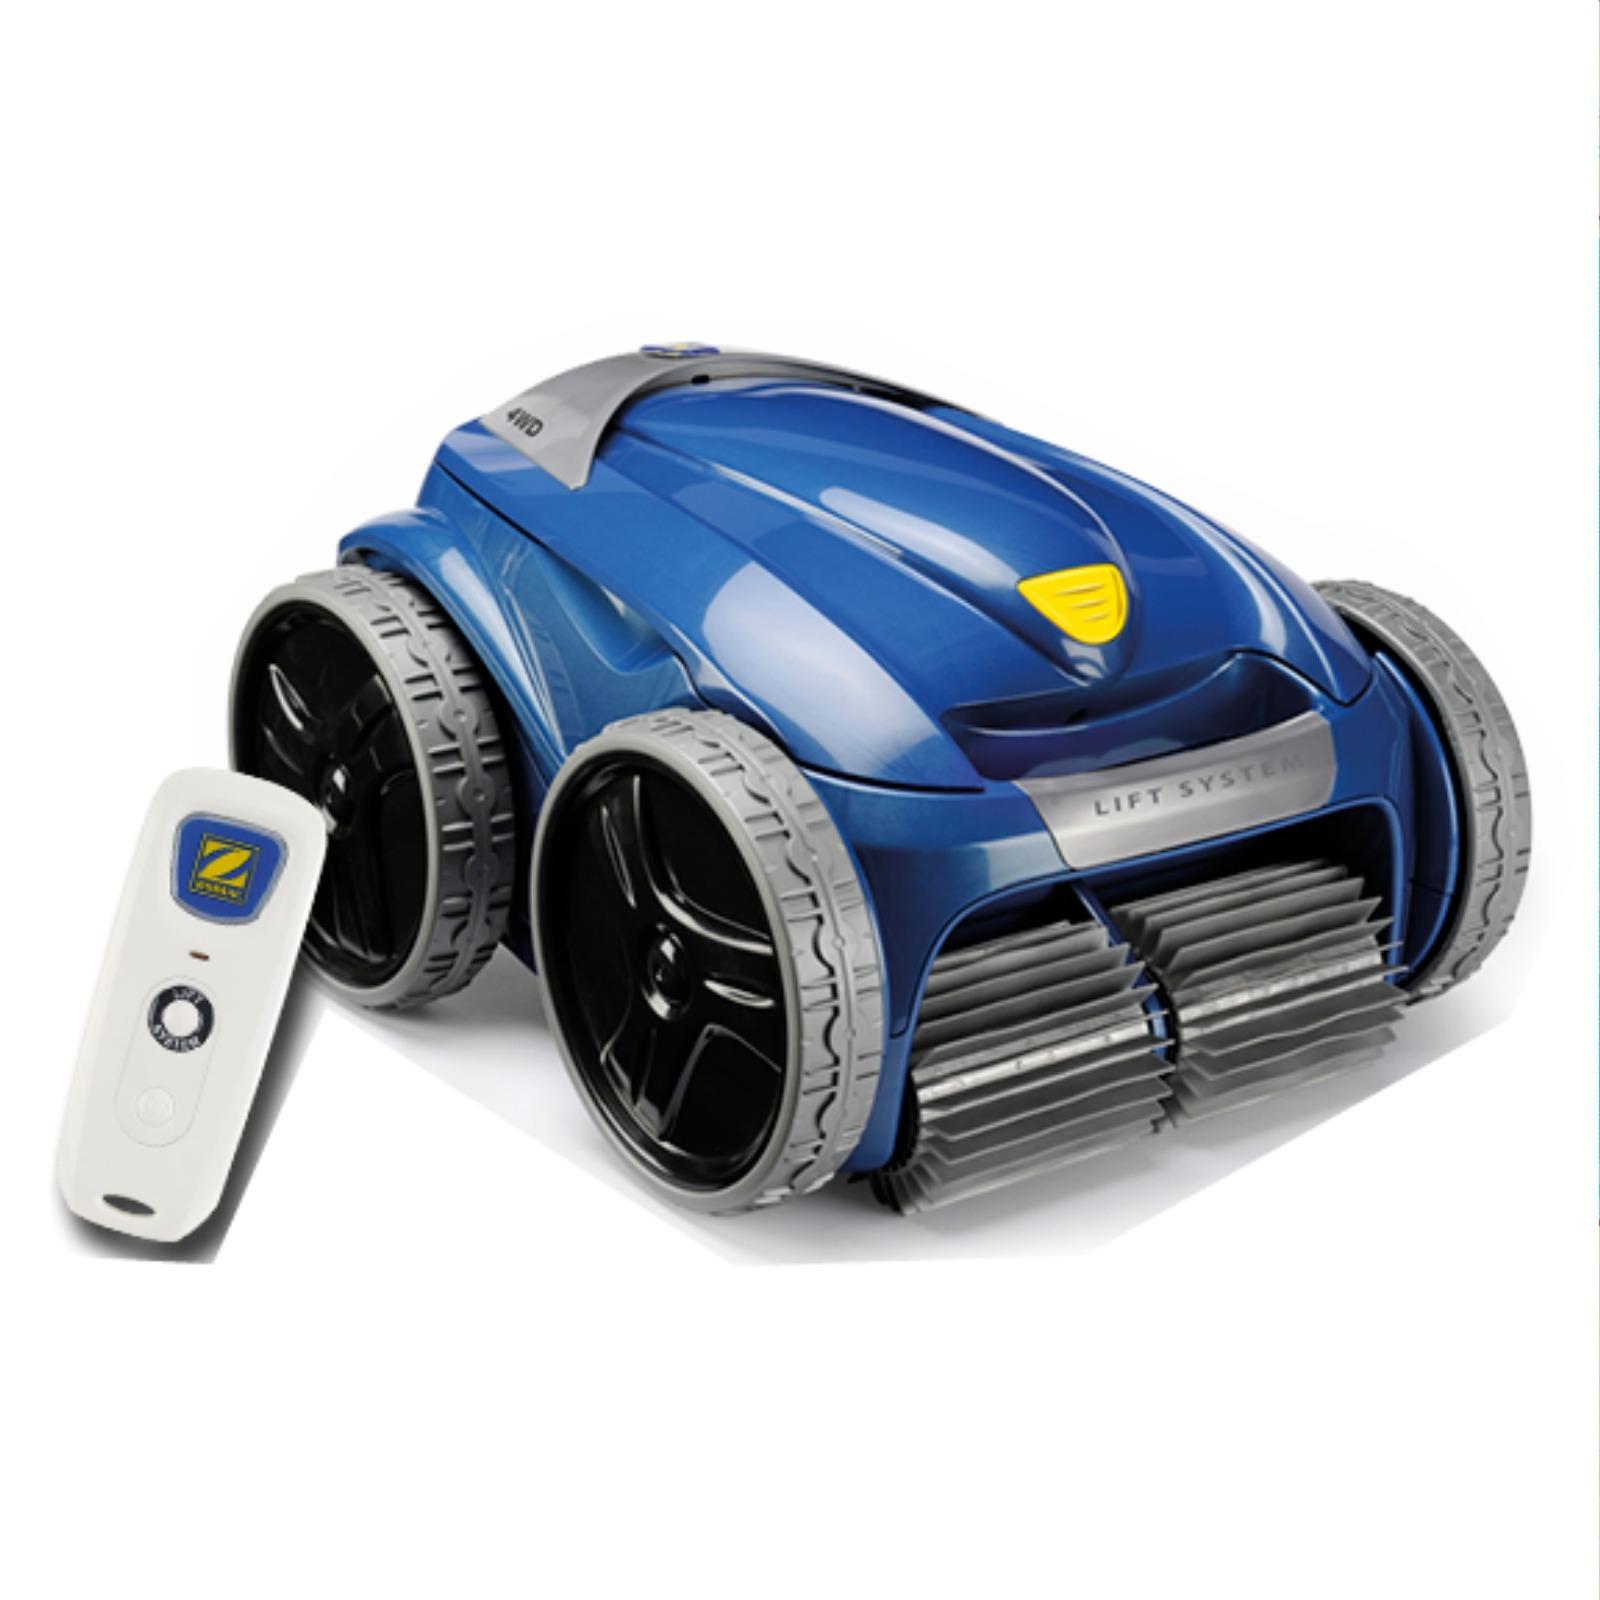 Best 28 qoqa ch zodiac rv 5500 rv 5500 tecnicpool rv for Robot piscine